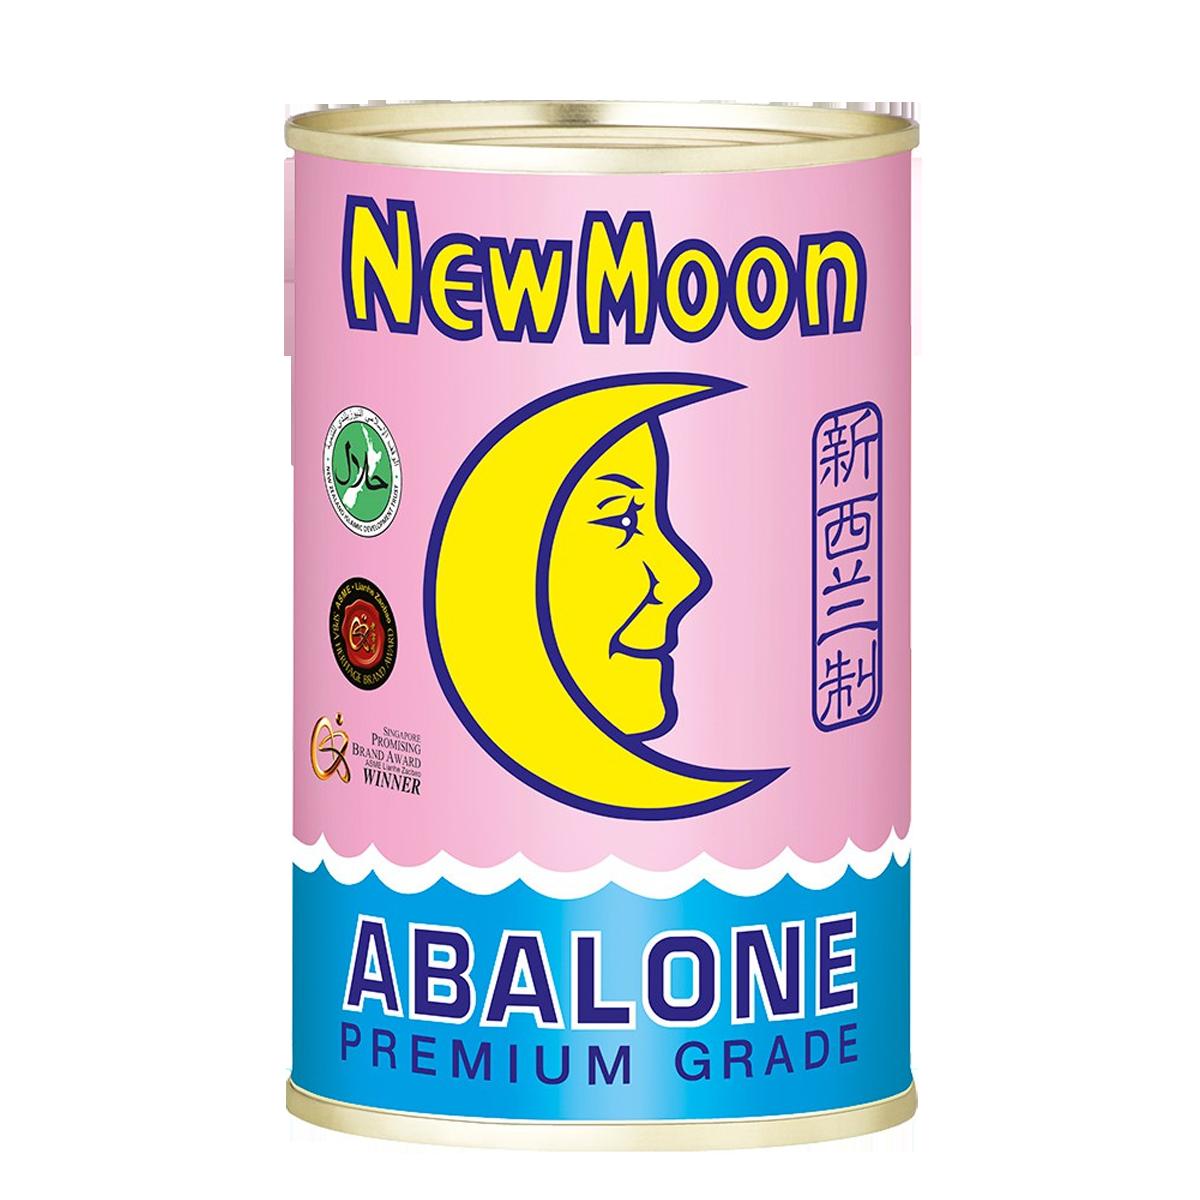 New Moon Abalone Premium Grade 425g